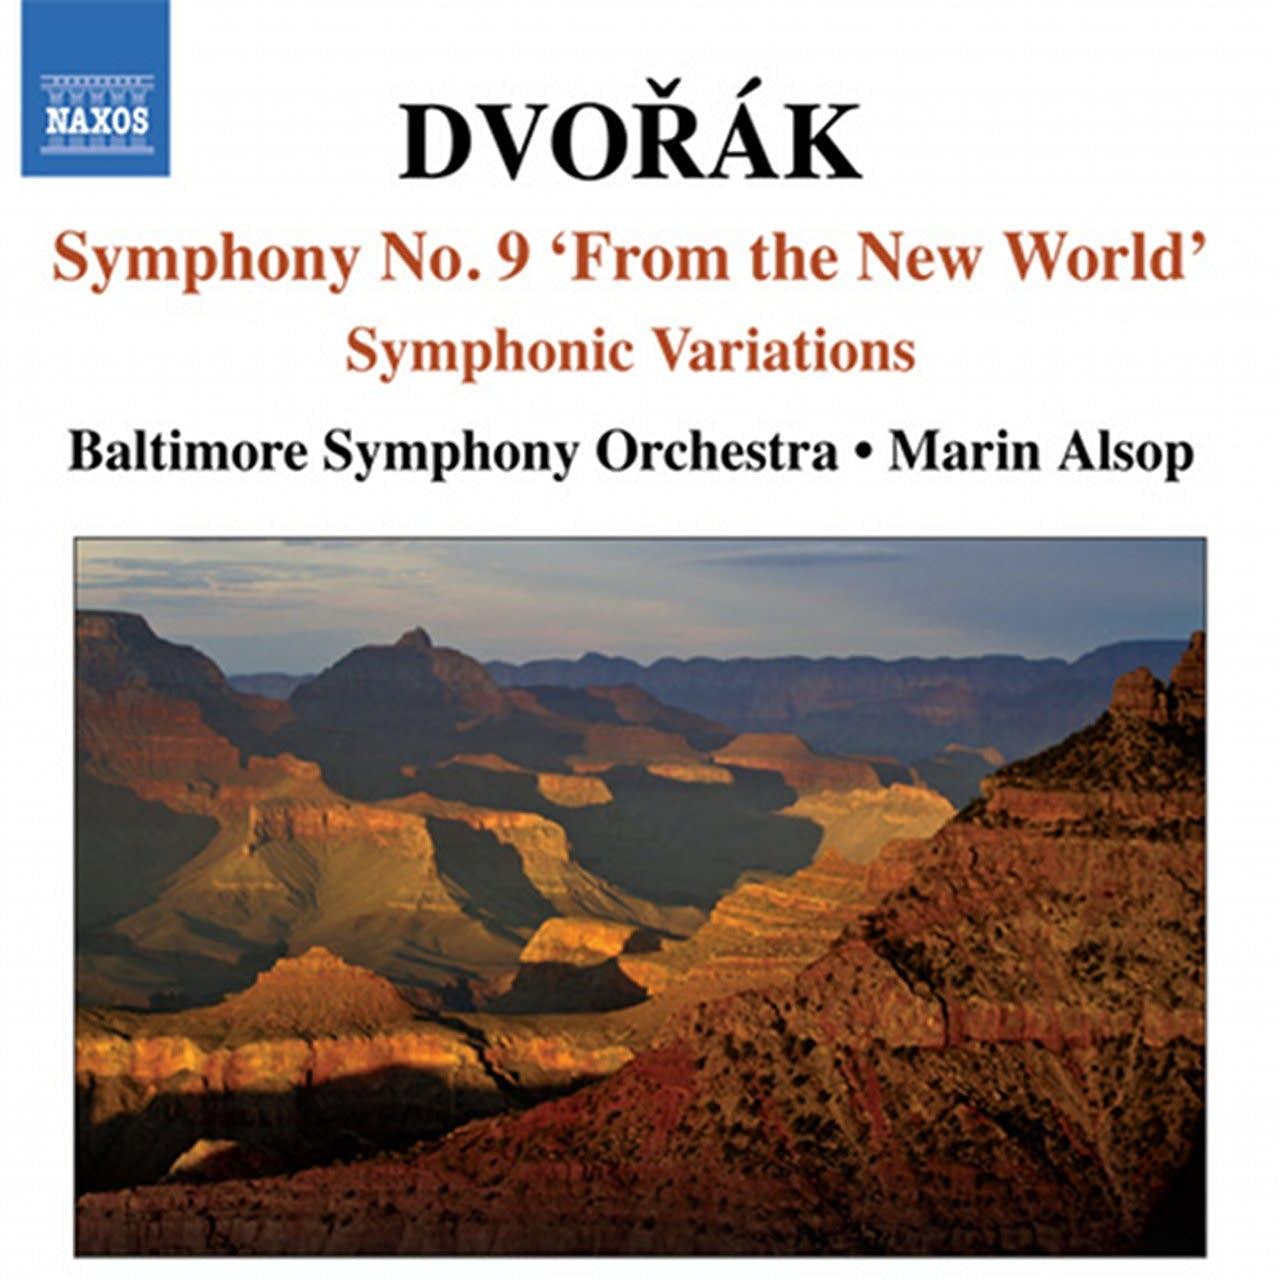 Antonin Dvorak - Symphony No. 9: I. Adagio - Allegro molto